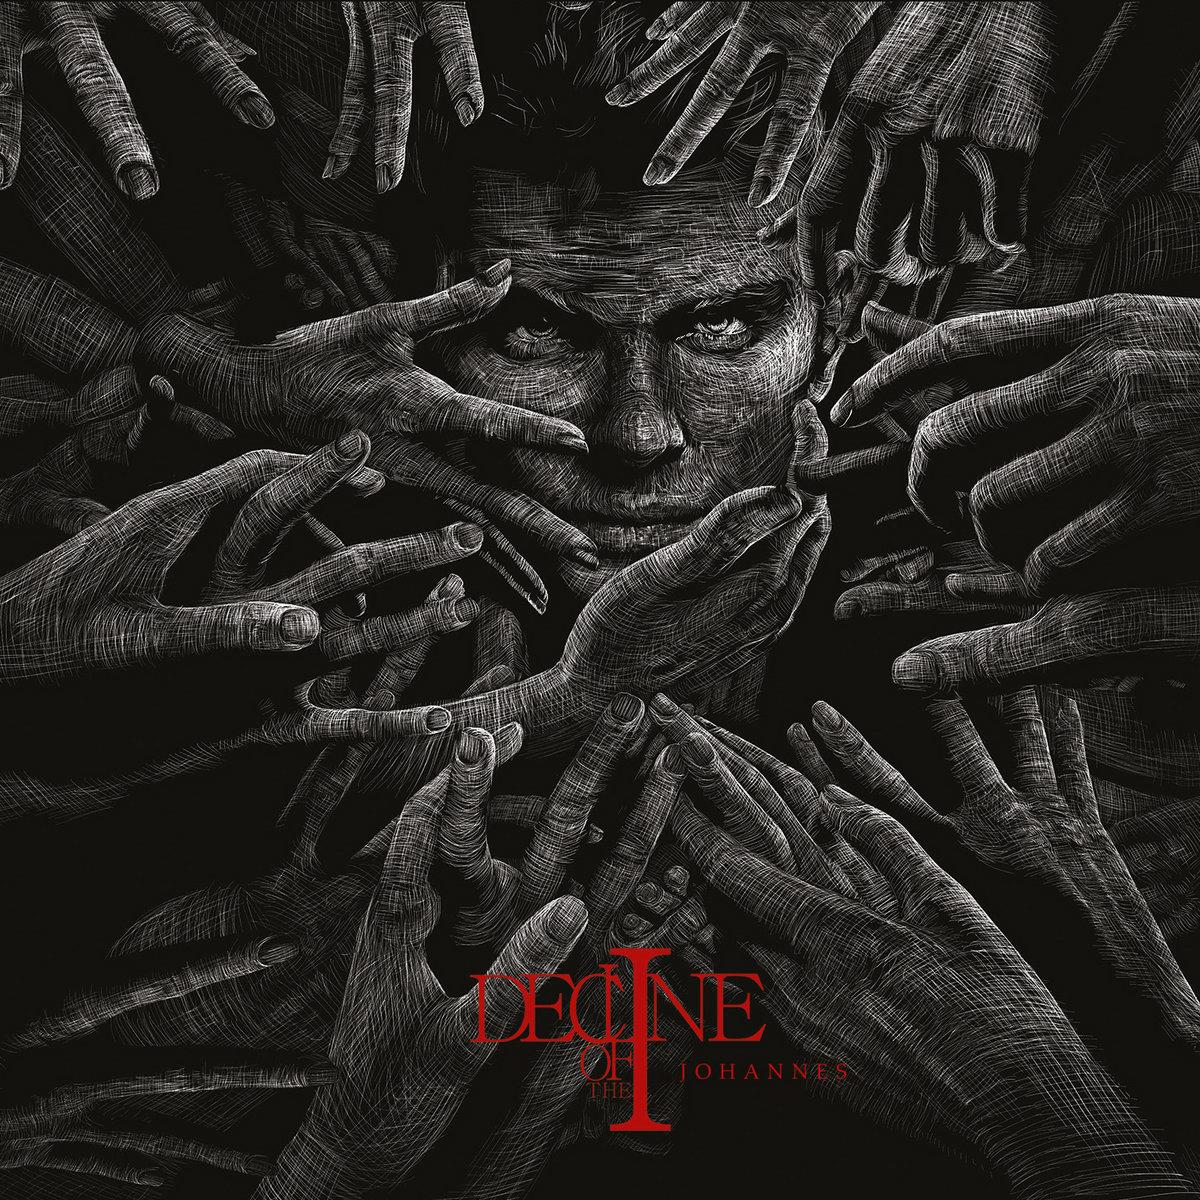 Decline Of The I Diev Vide Album Cover Artwork